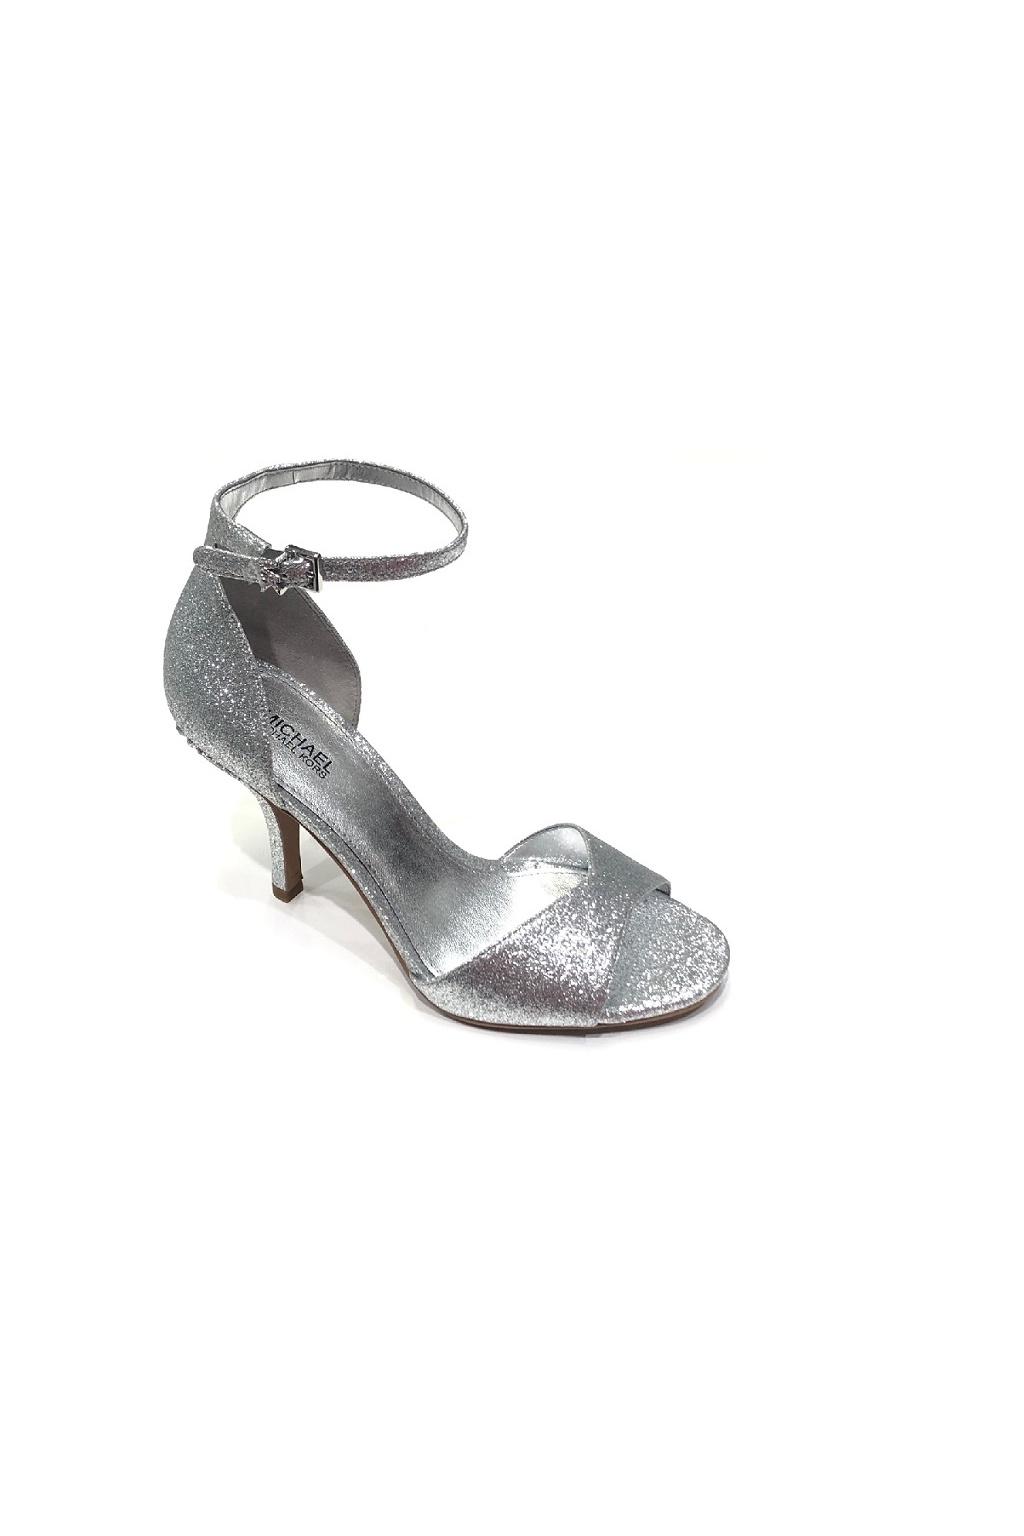 40R0MLHA1D Dámské sandály Malinda Pixie Fine Gliter stříbrné